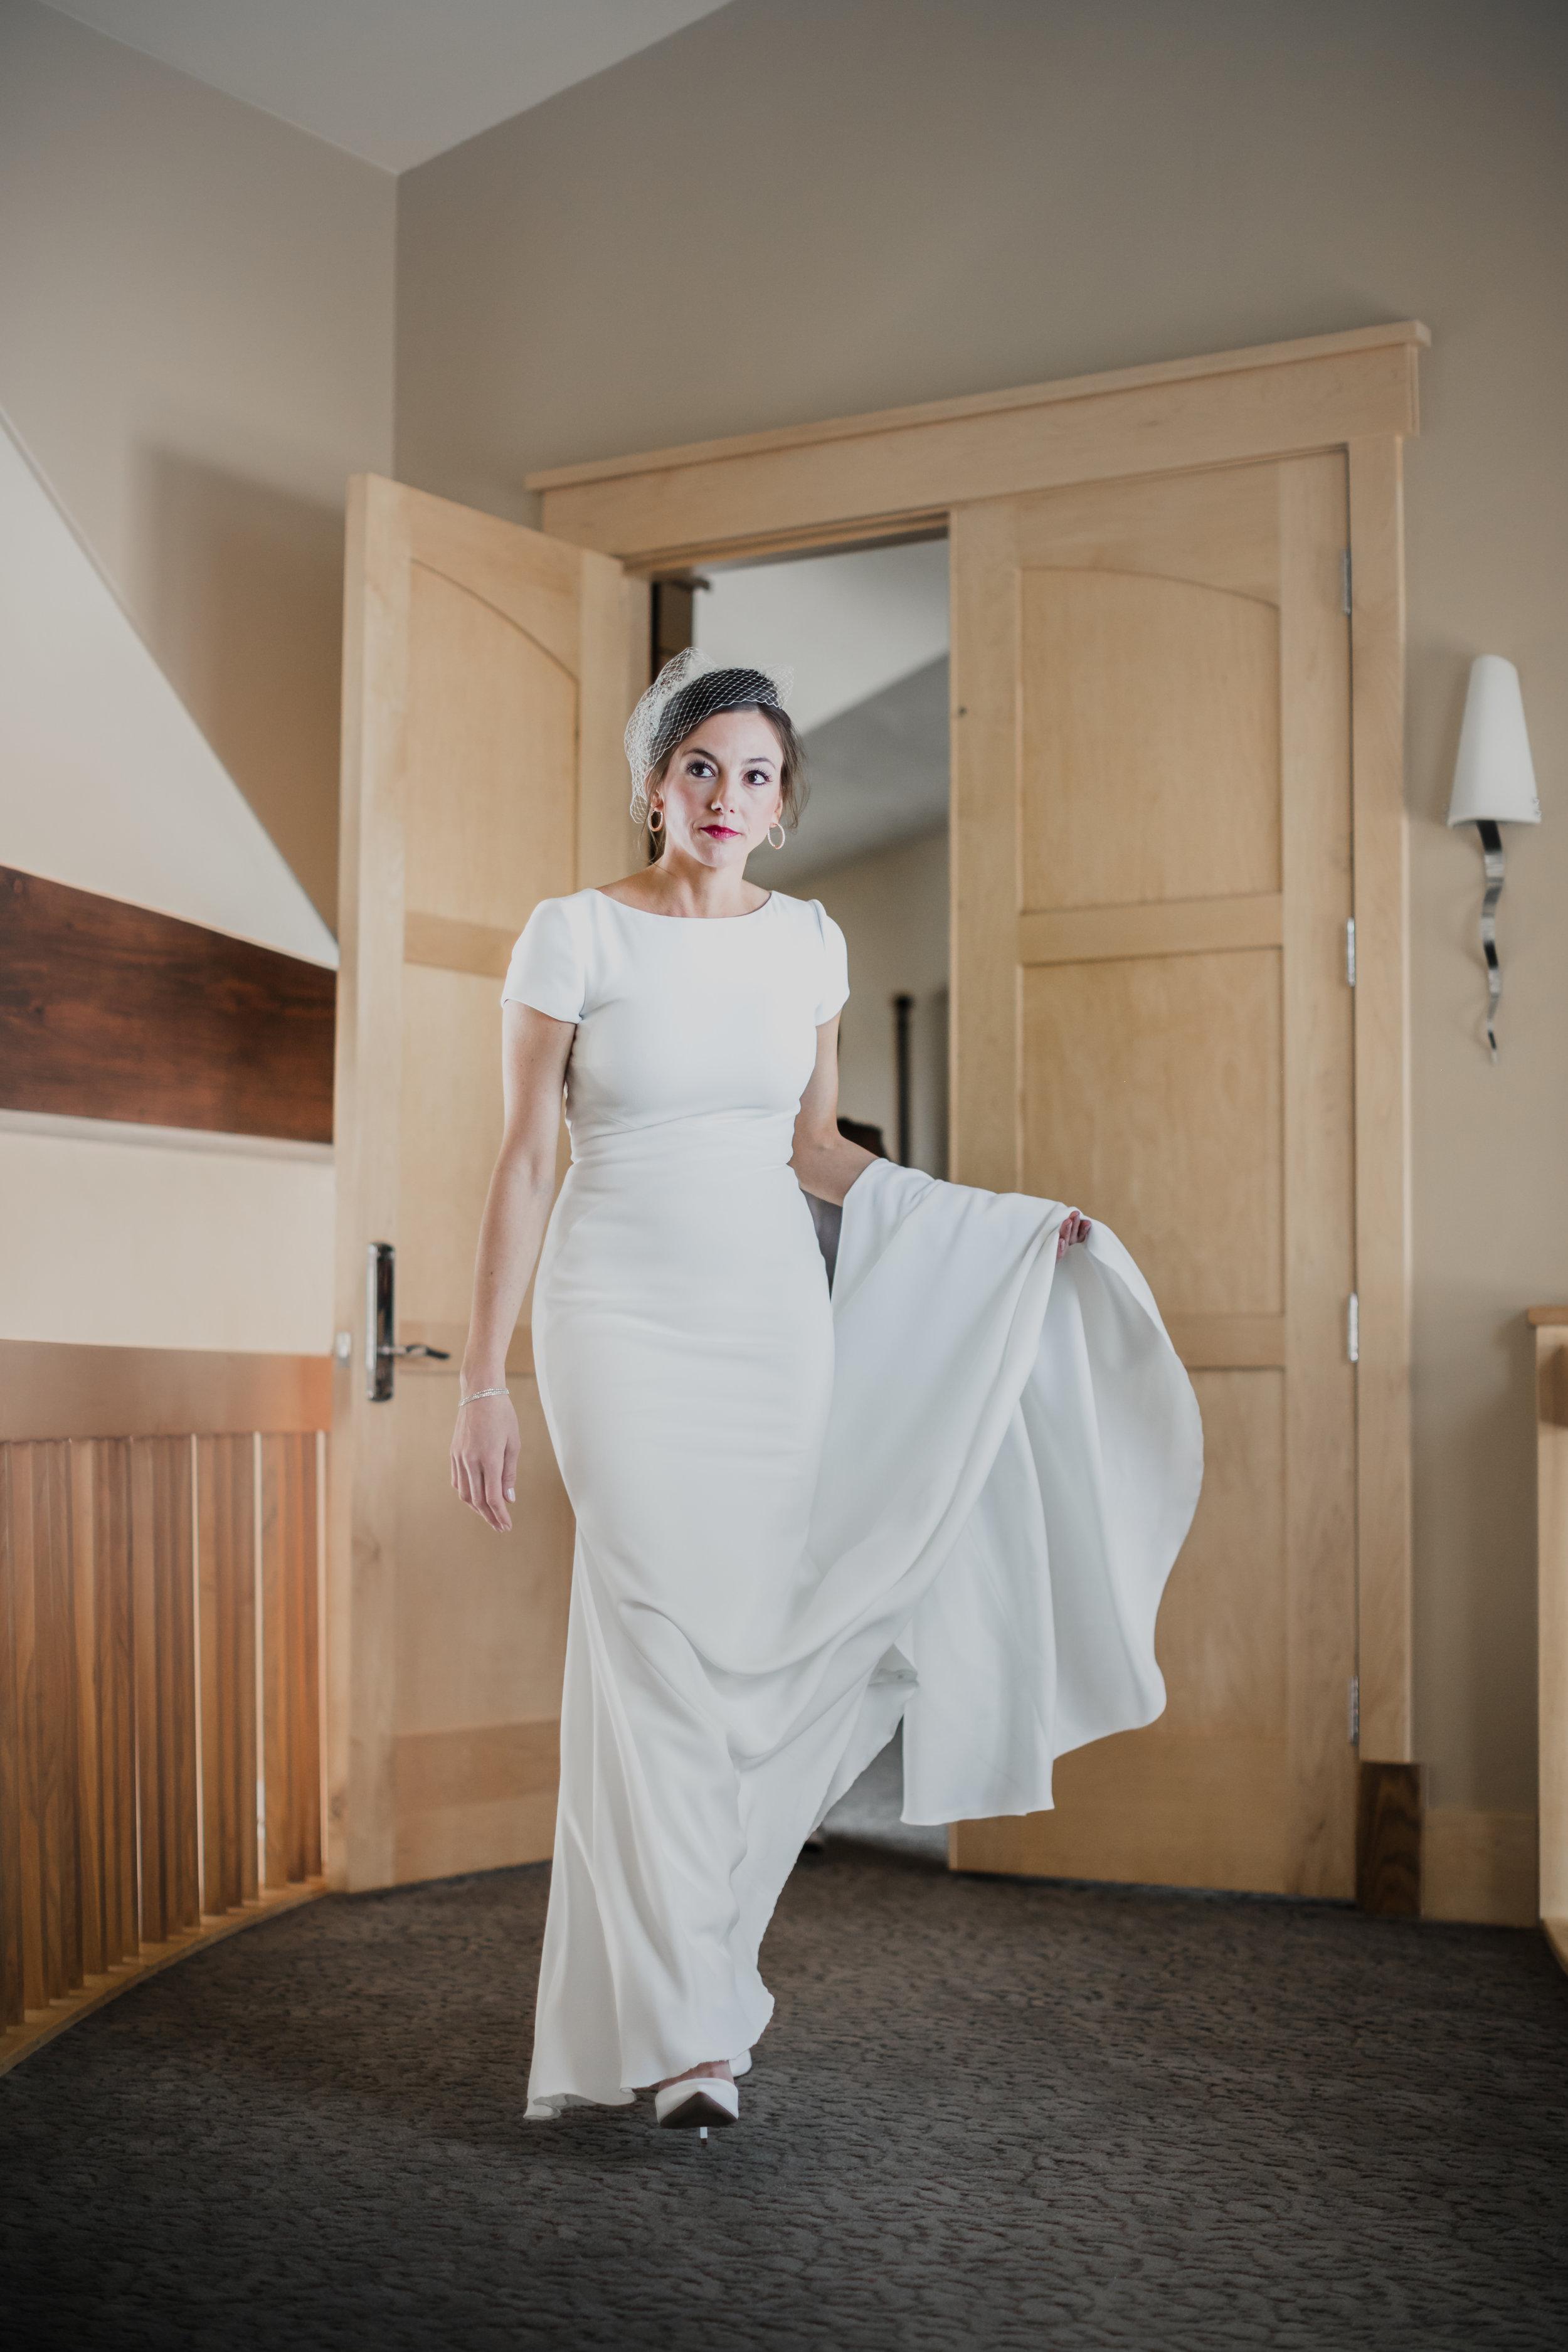 vild-photography-photographer-colorado-intimate-wedding-adventure-Stephanie- Adam-186.jpg